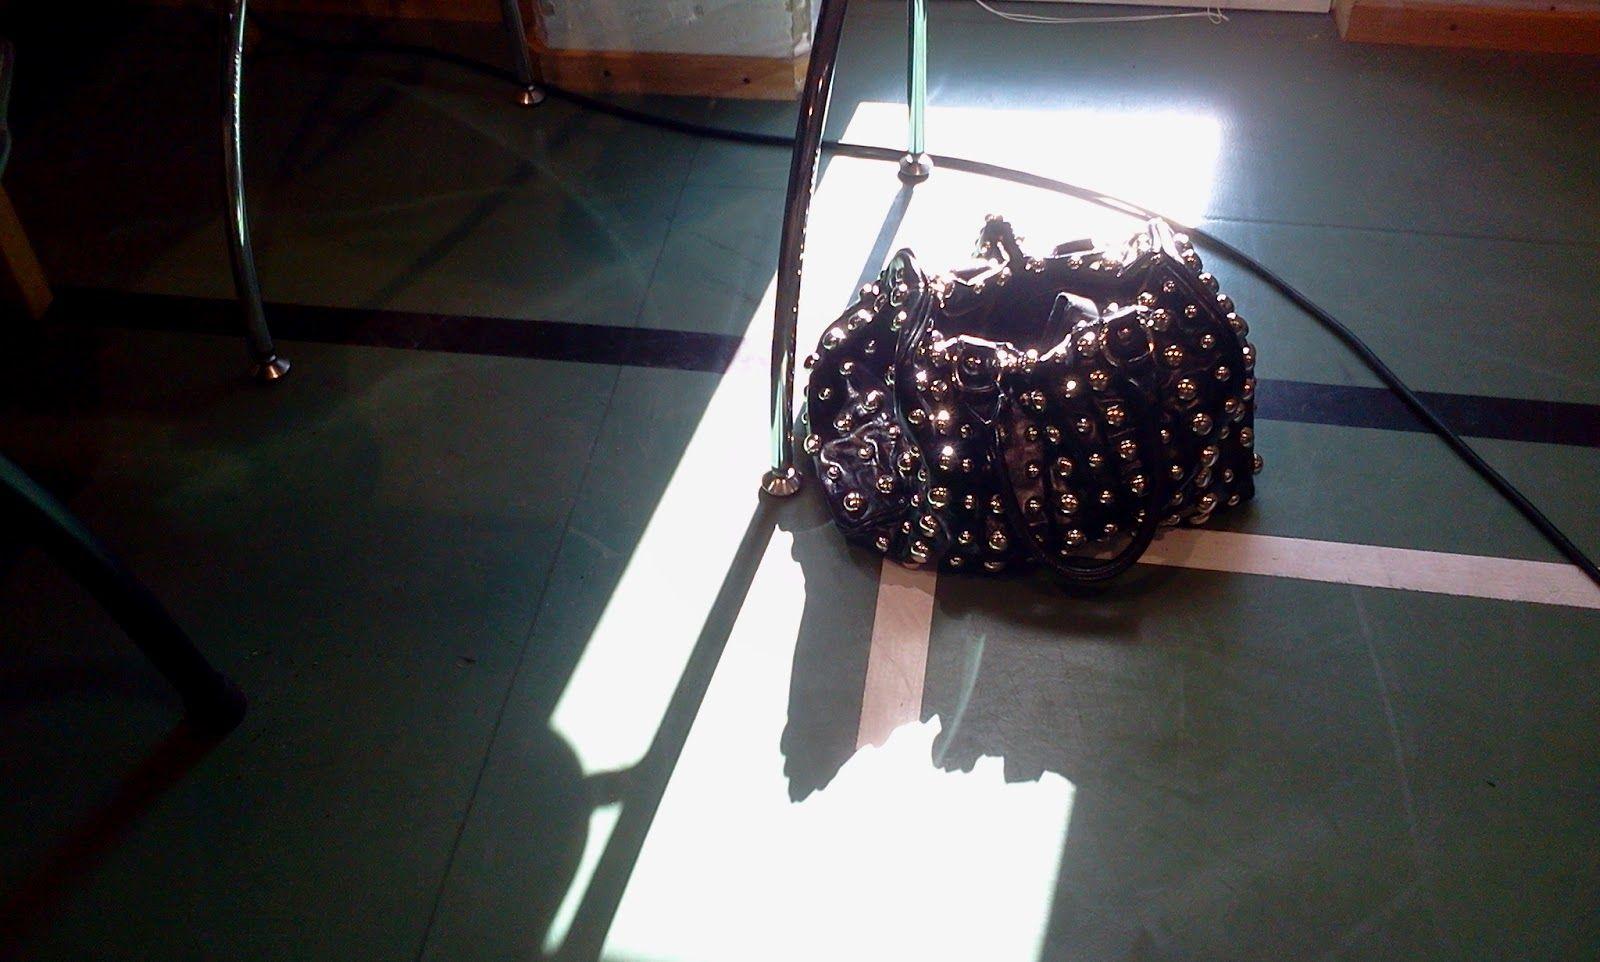 Merkonomin laukku